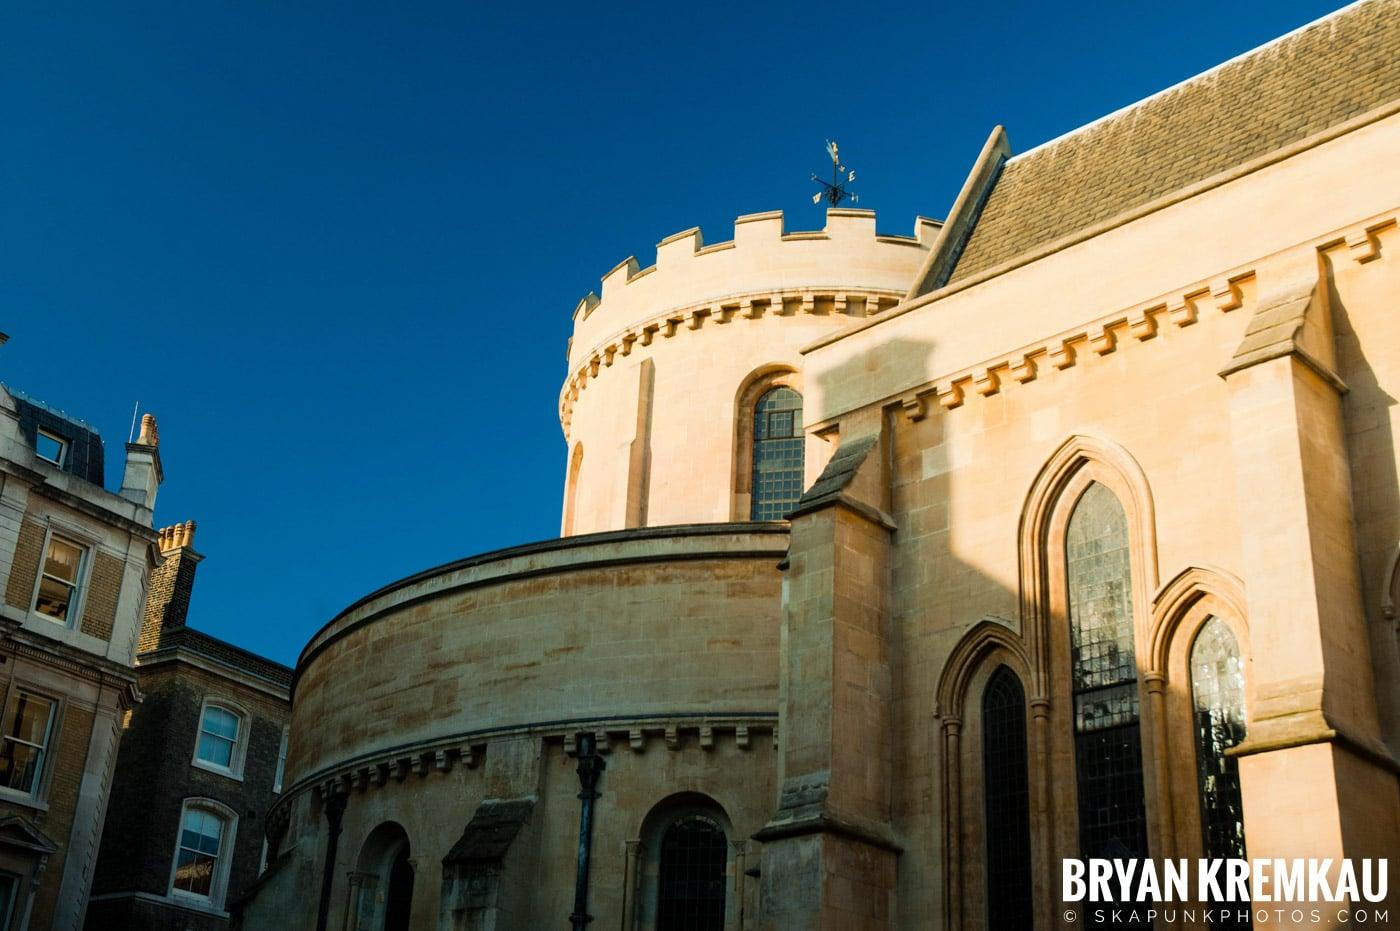 London, England - Day 2 - 12.9.06 (13)